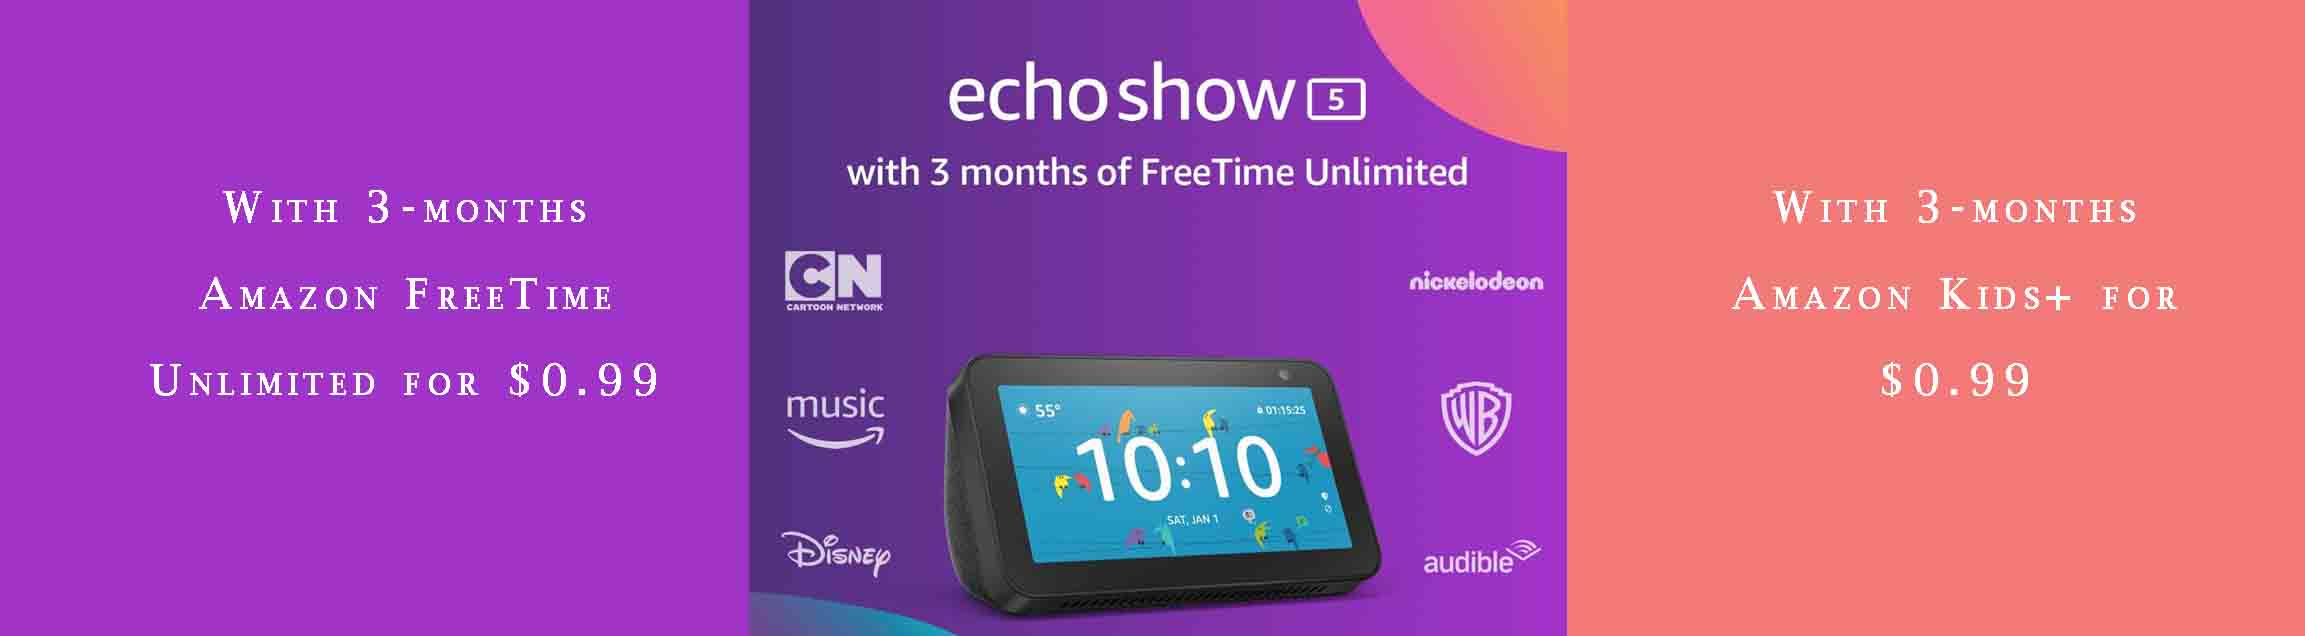 Echo device promo code